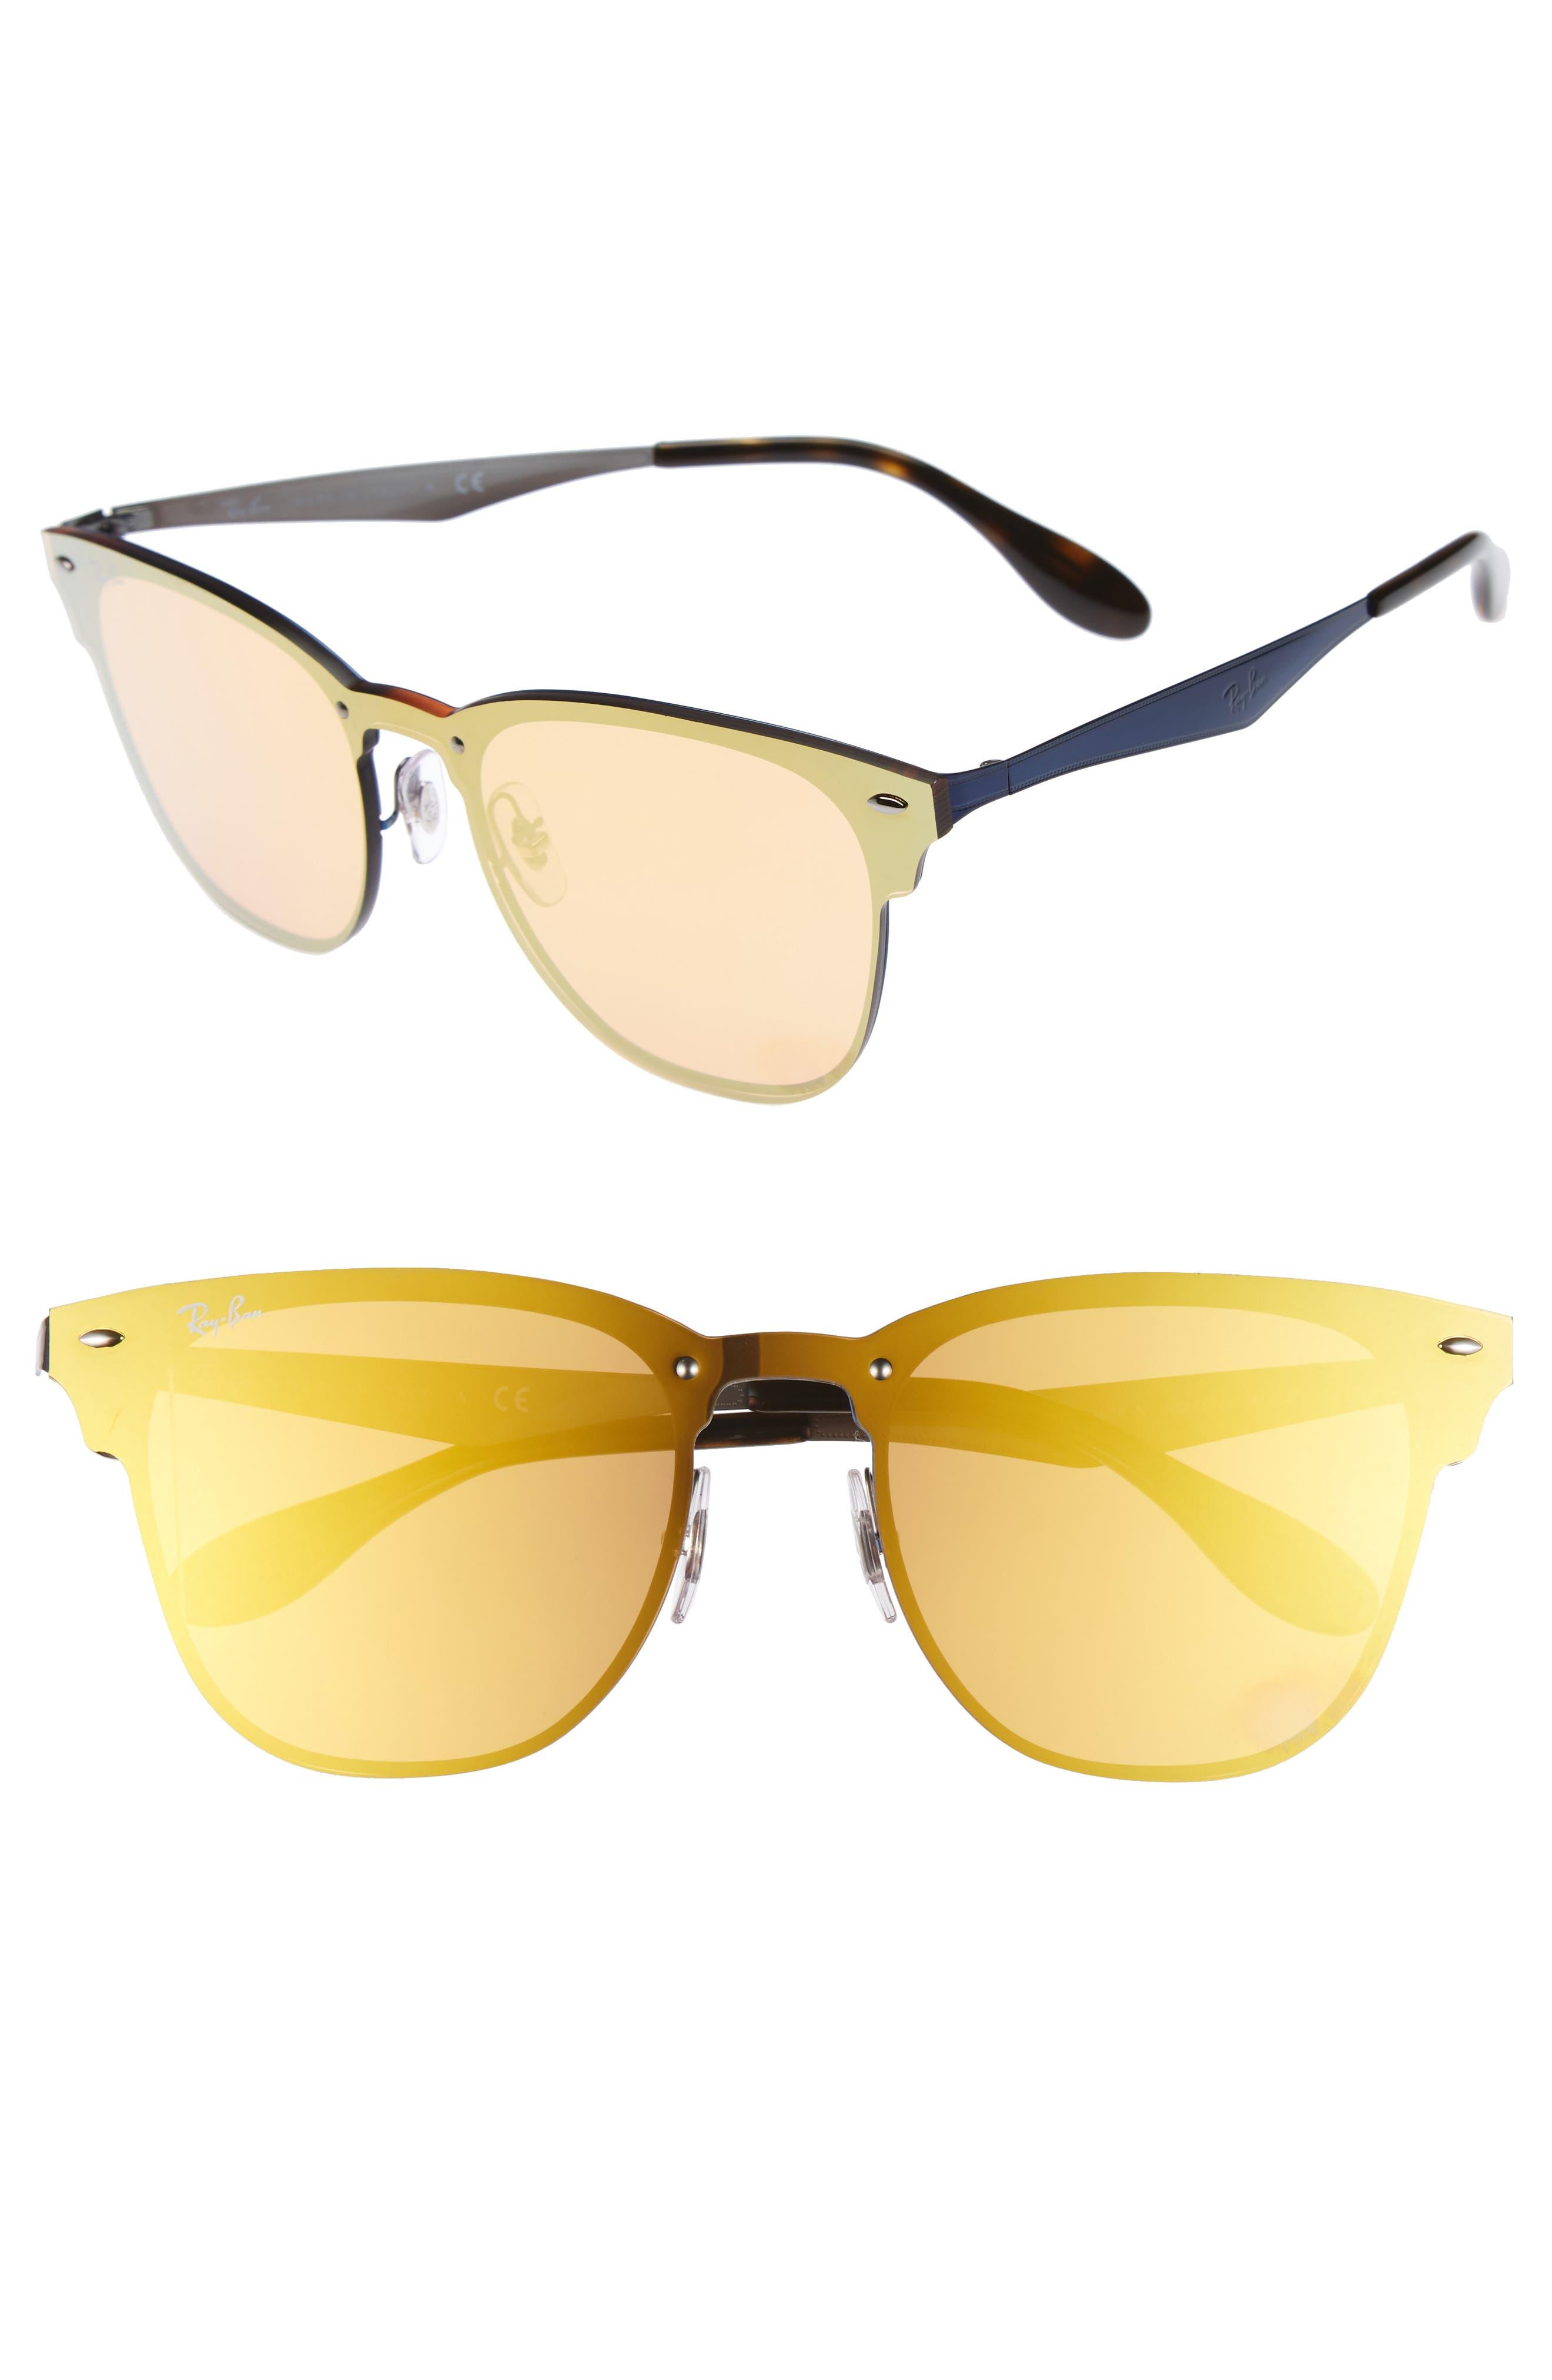 52mm Mirrored Sunglasses,                         Main,                         color, Blue/ Orange